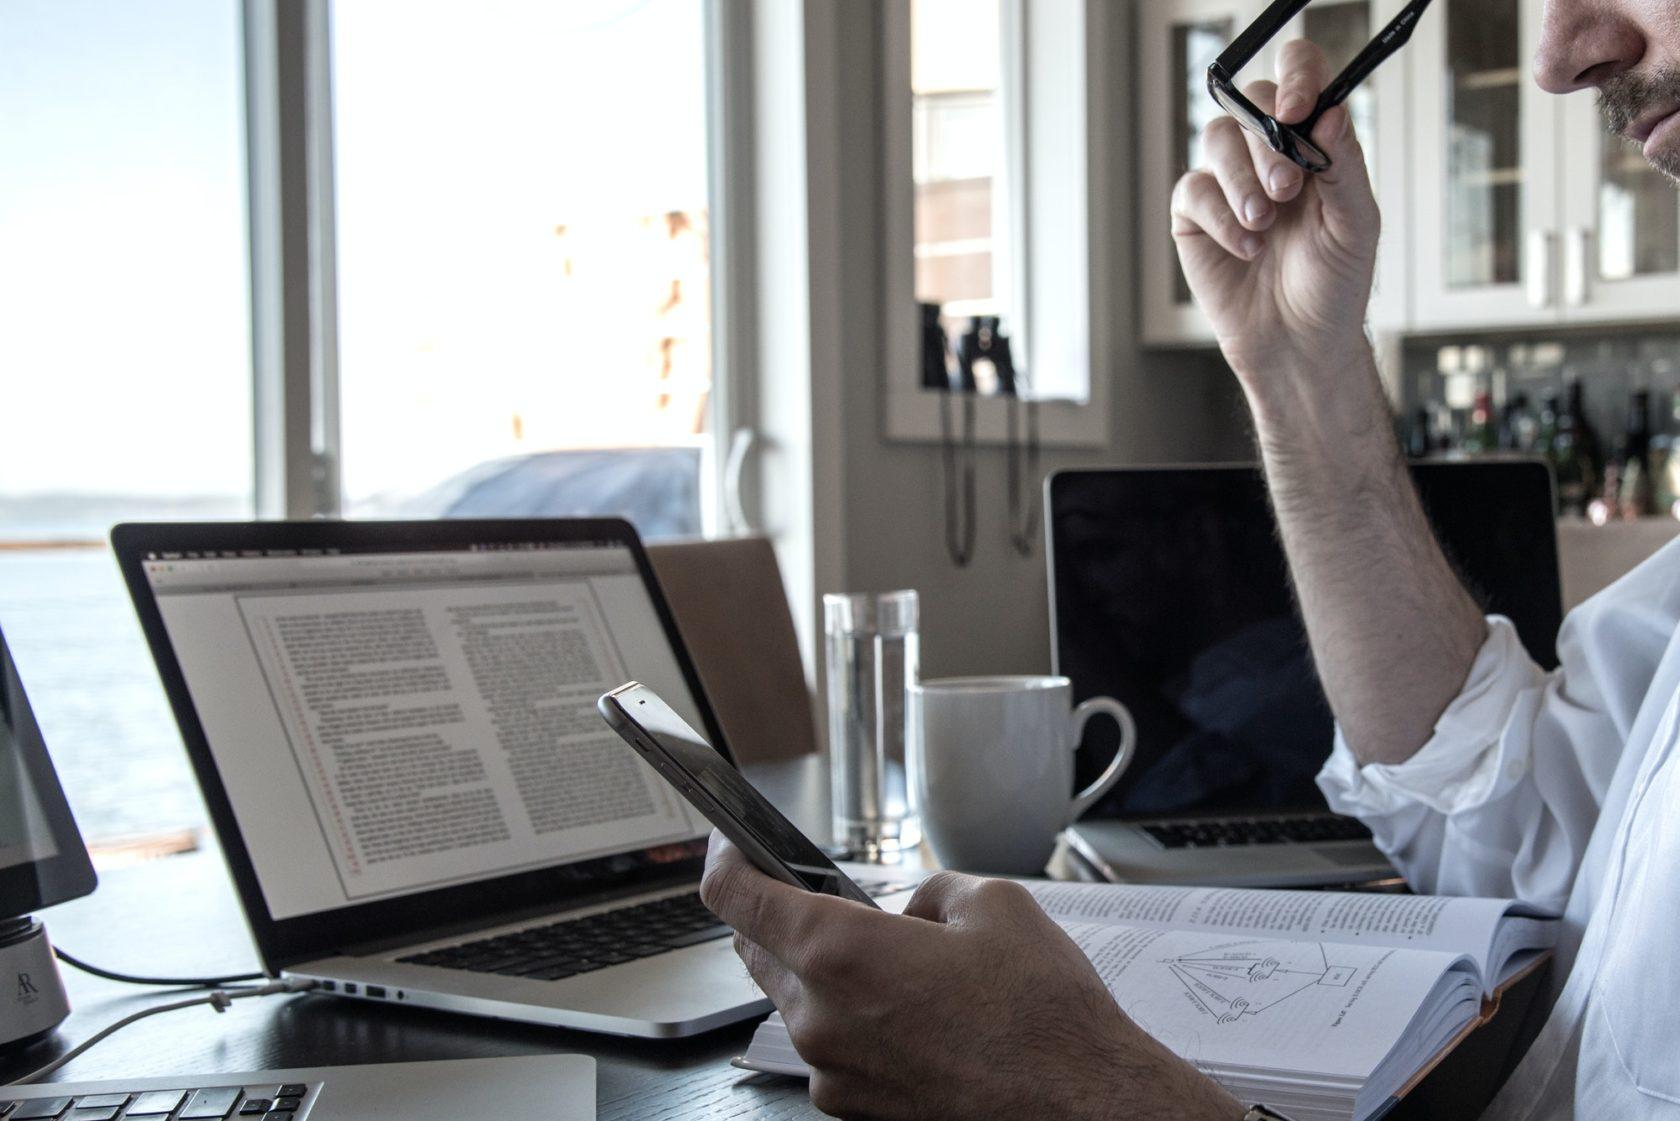 Top Apps to Read Newspaper Online